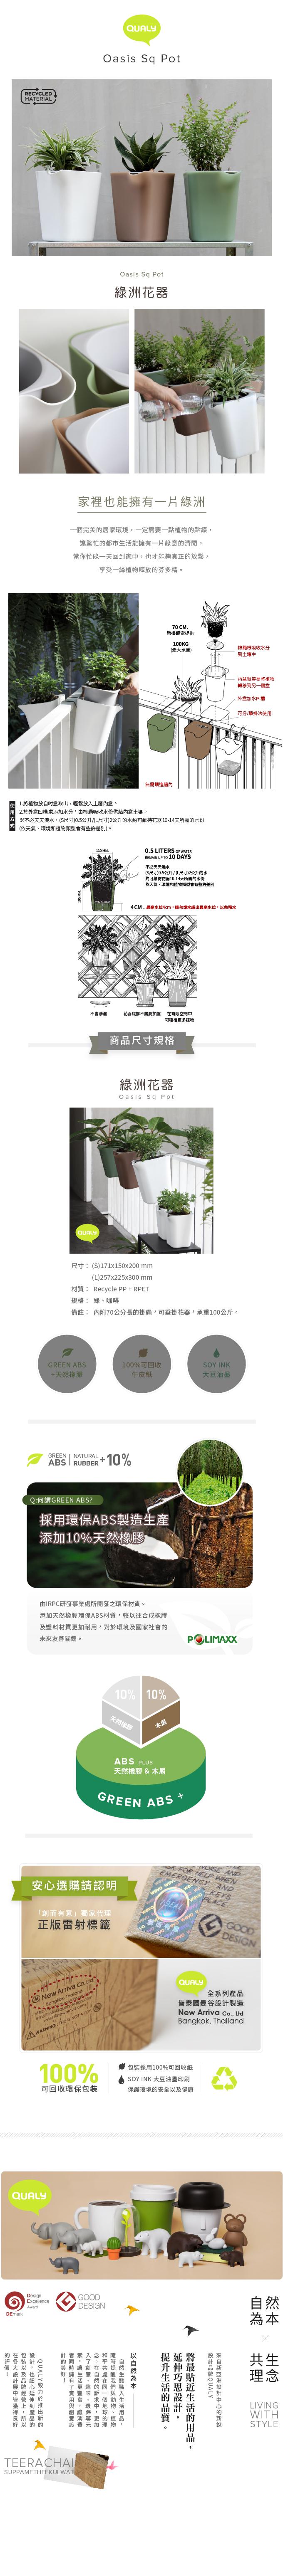 QUALY|綠洲方形花器L